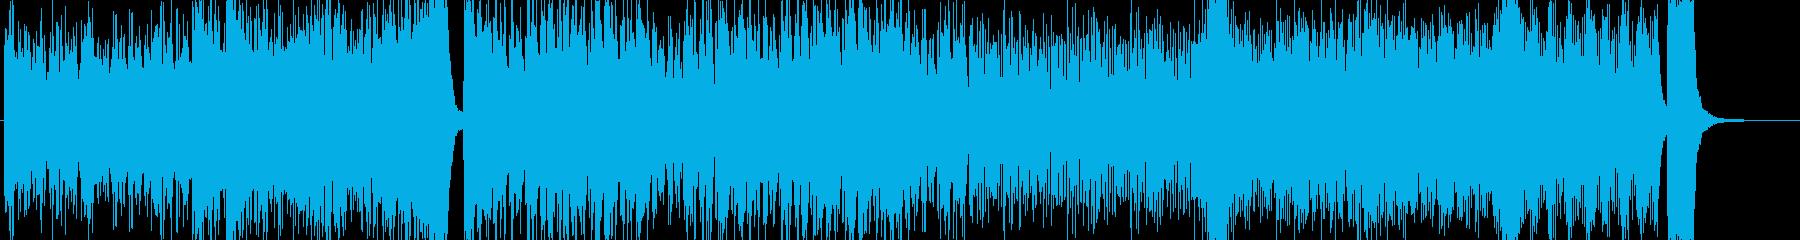 B)WAVE 16bit 44.1khzの再生済みの波形